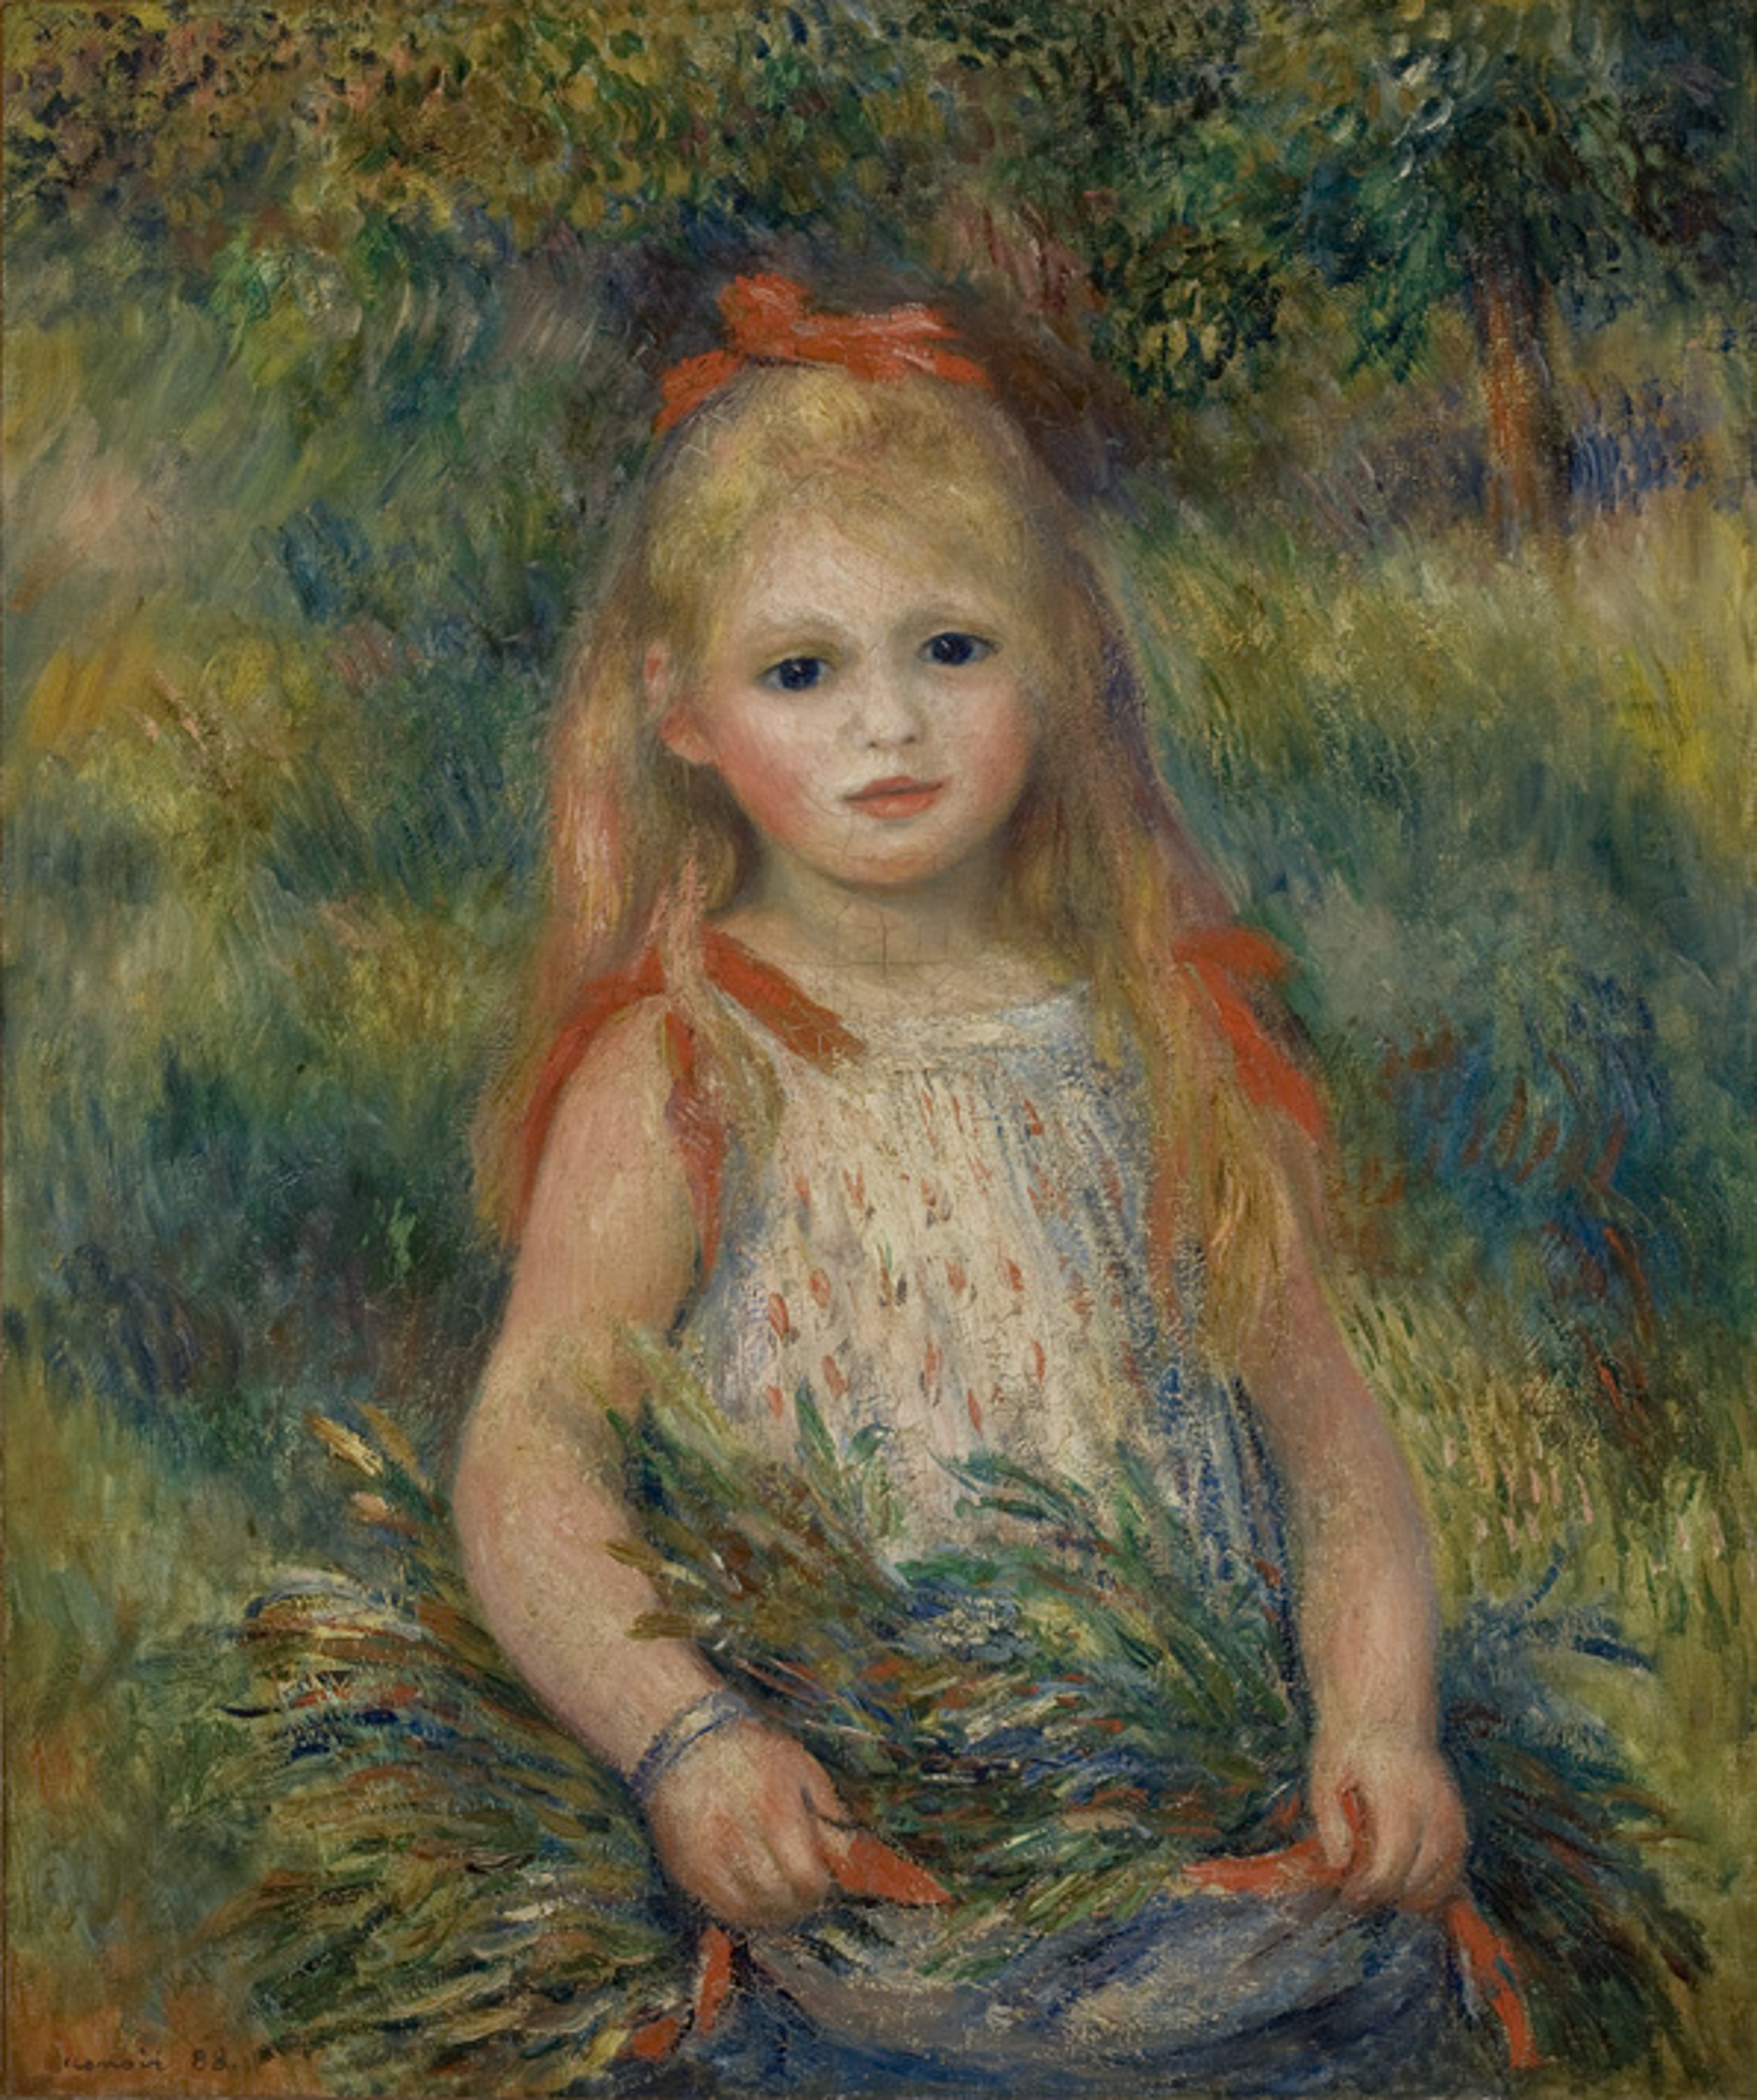 Niña con flores, de 1888. Pierre-Auguste Renoir